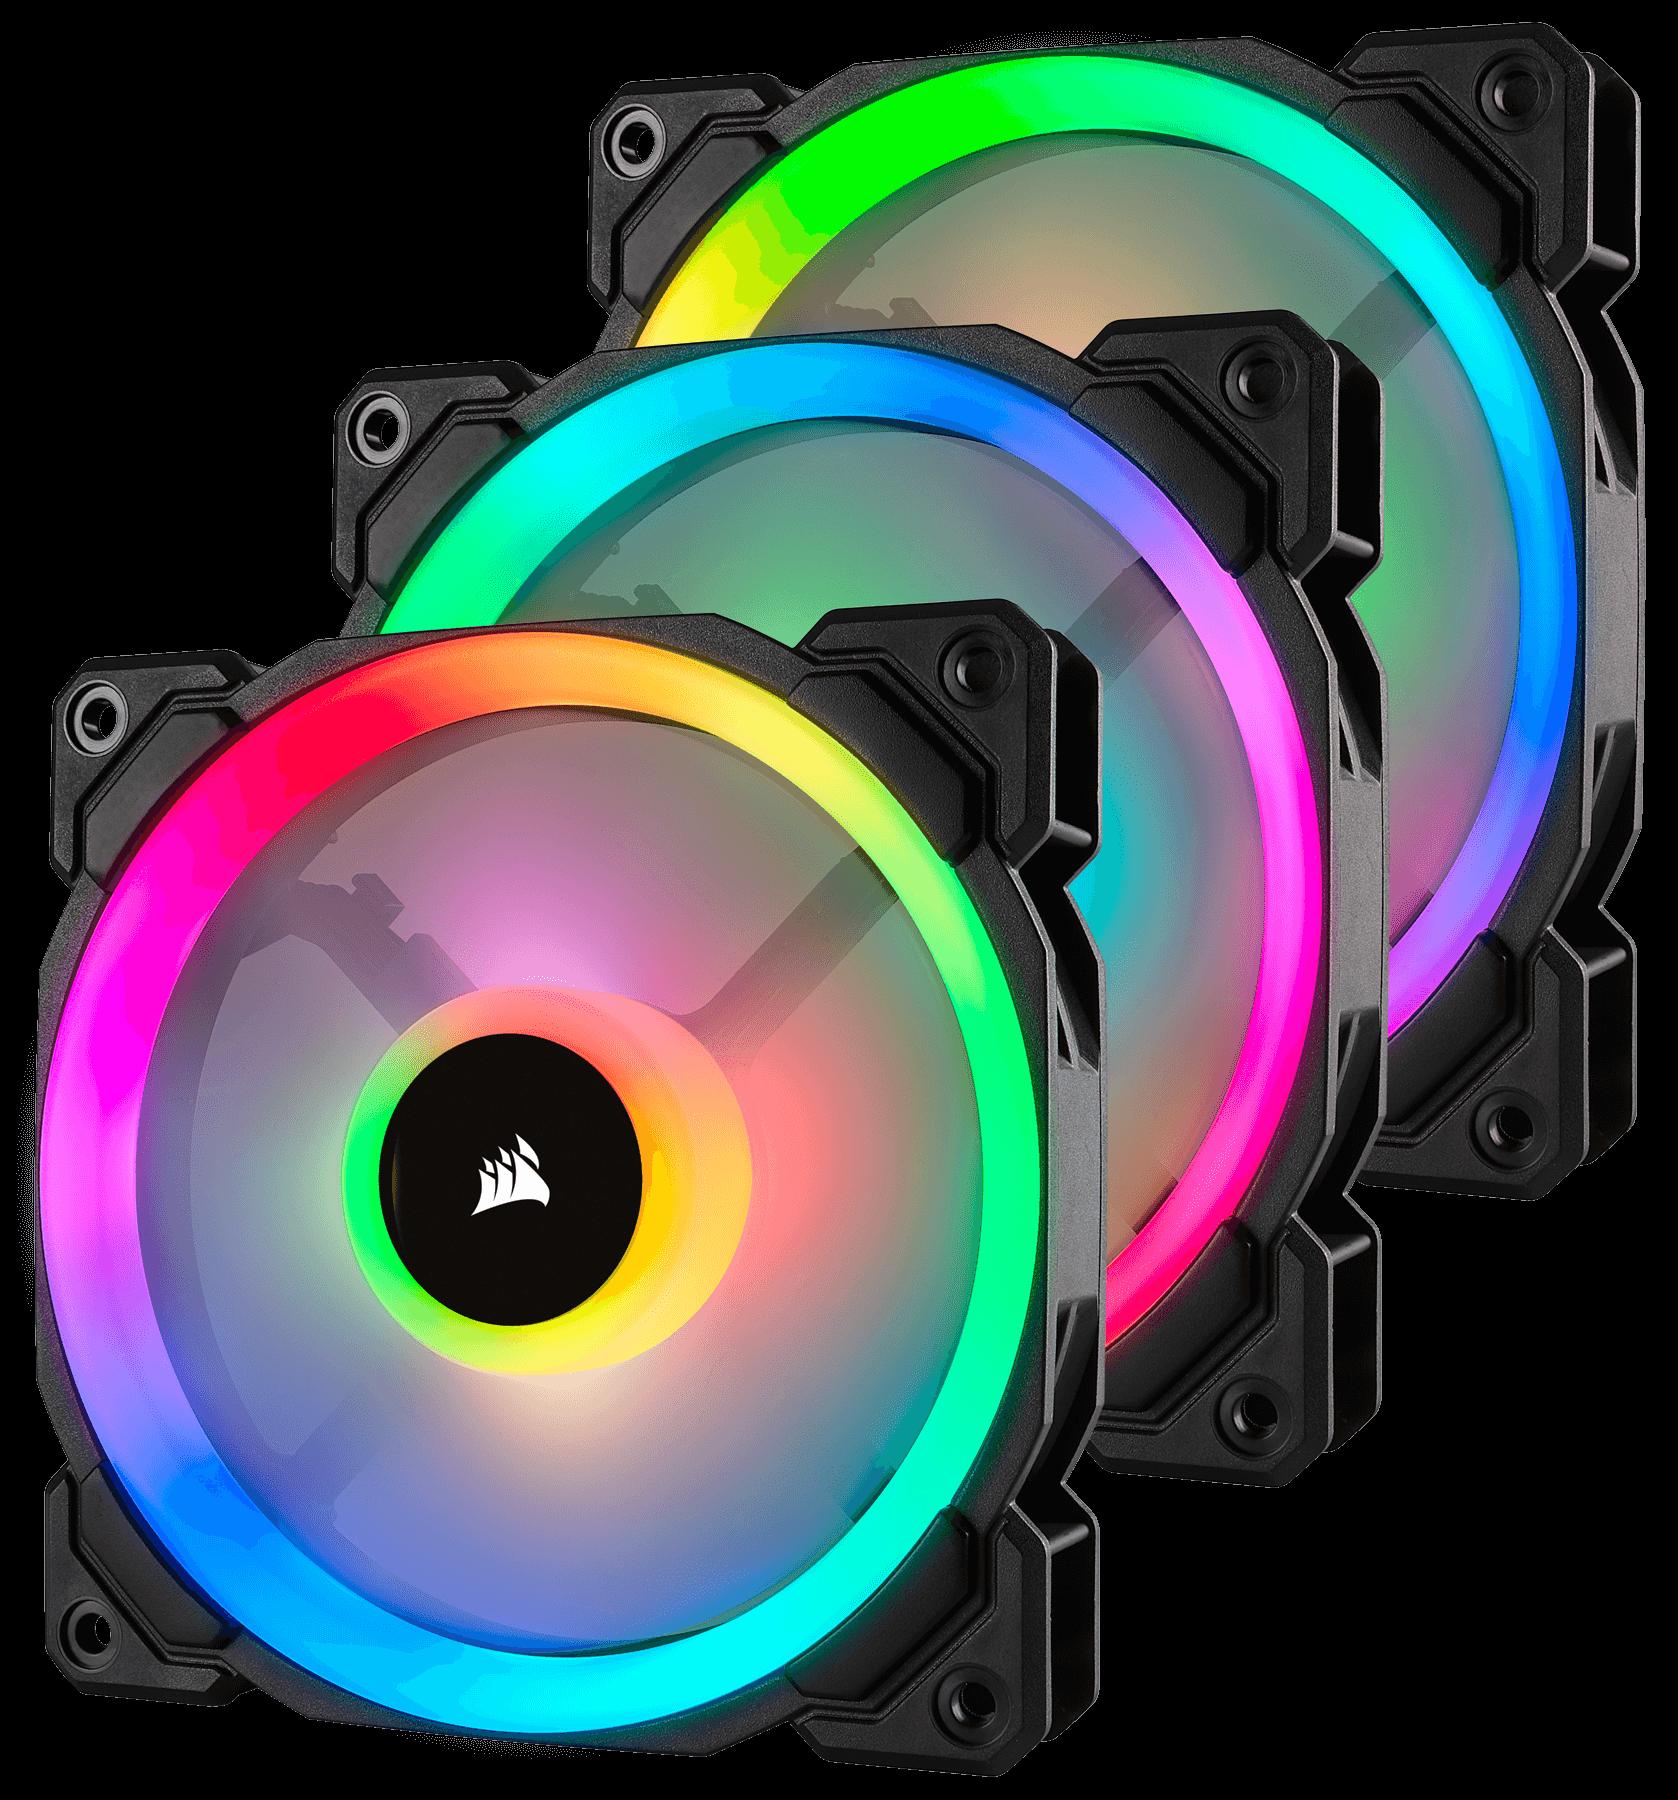 Fan Corsair LL120 RGB 120mm Dual Light Loop RGB LED PWM Fan (Gồm 3 Fan với Lighting Node PRO) (CO-9050072-WW) 4